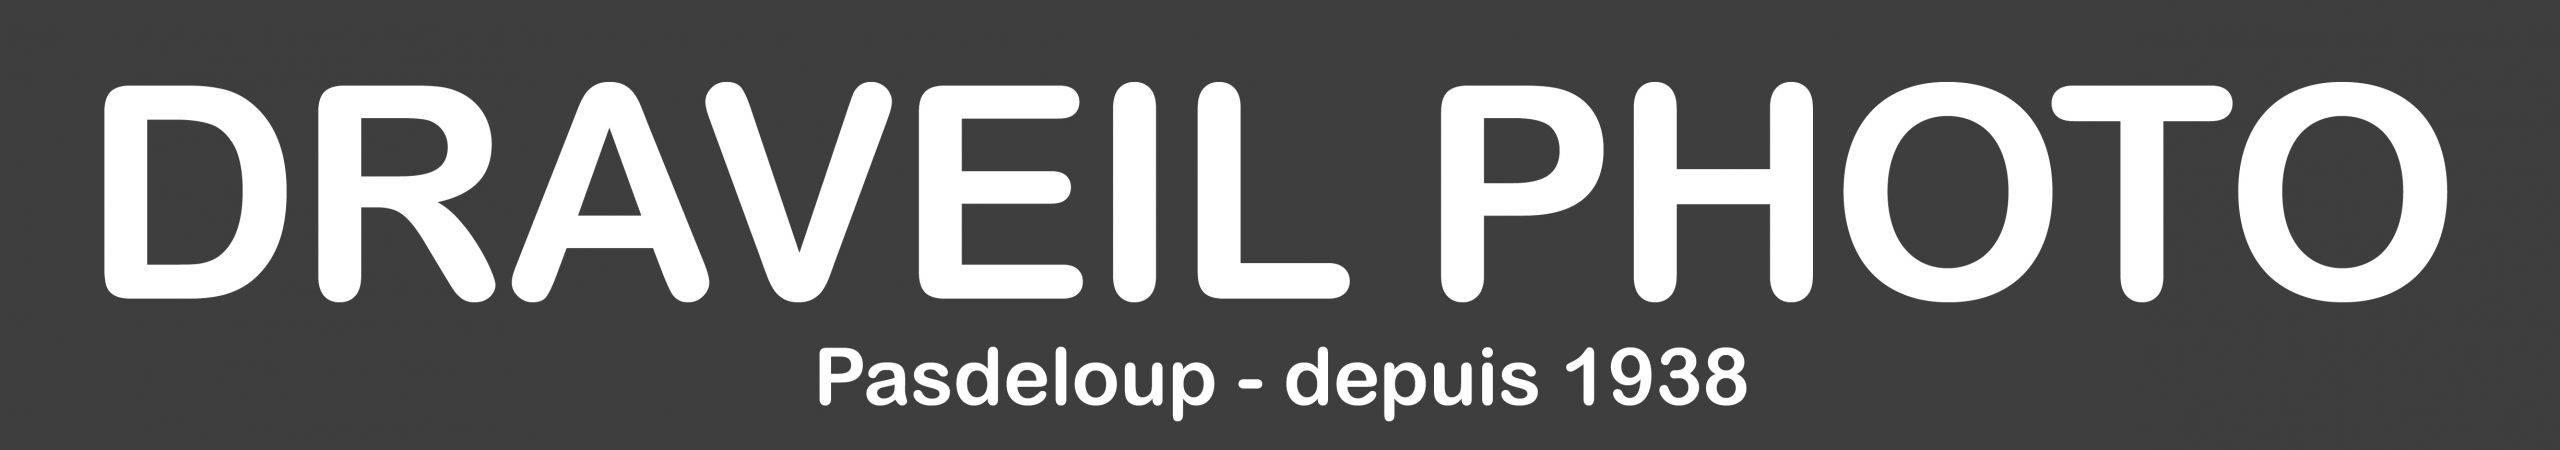 LogoV7 PUB scaled